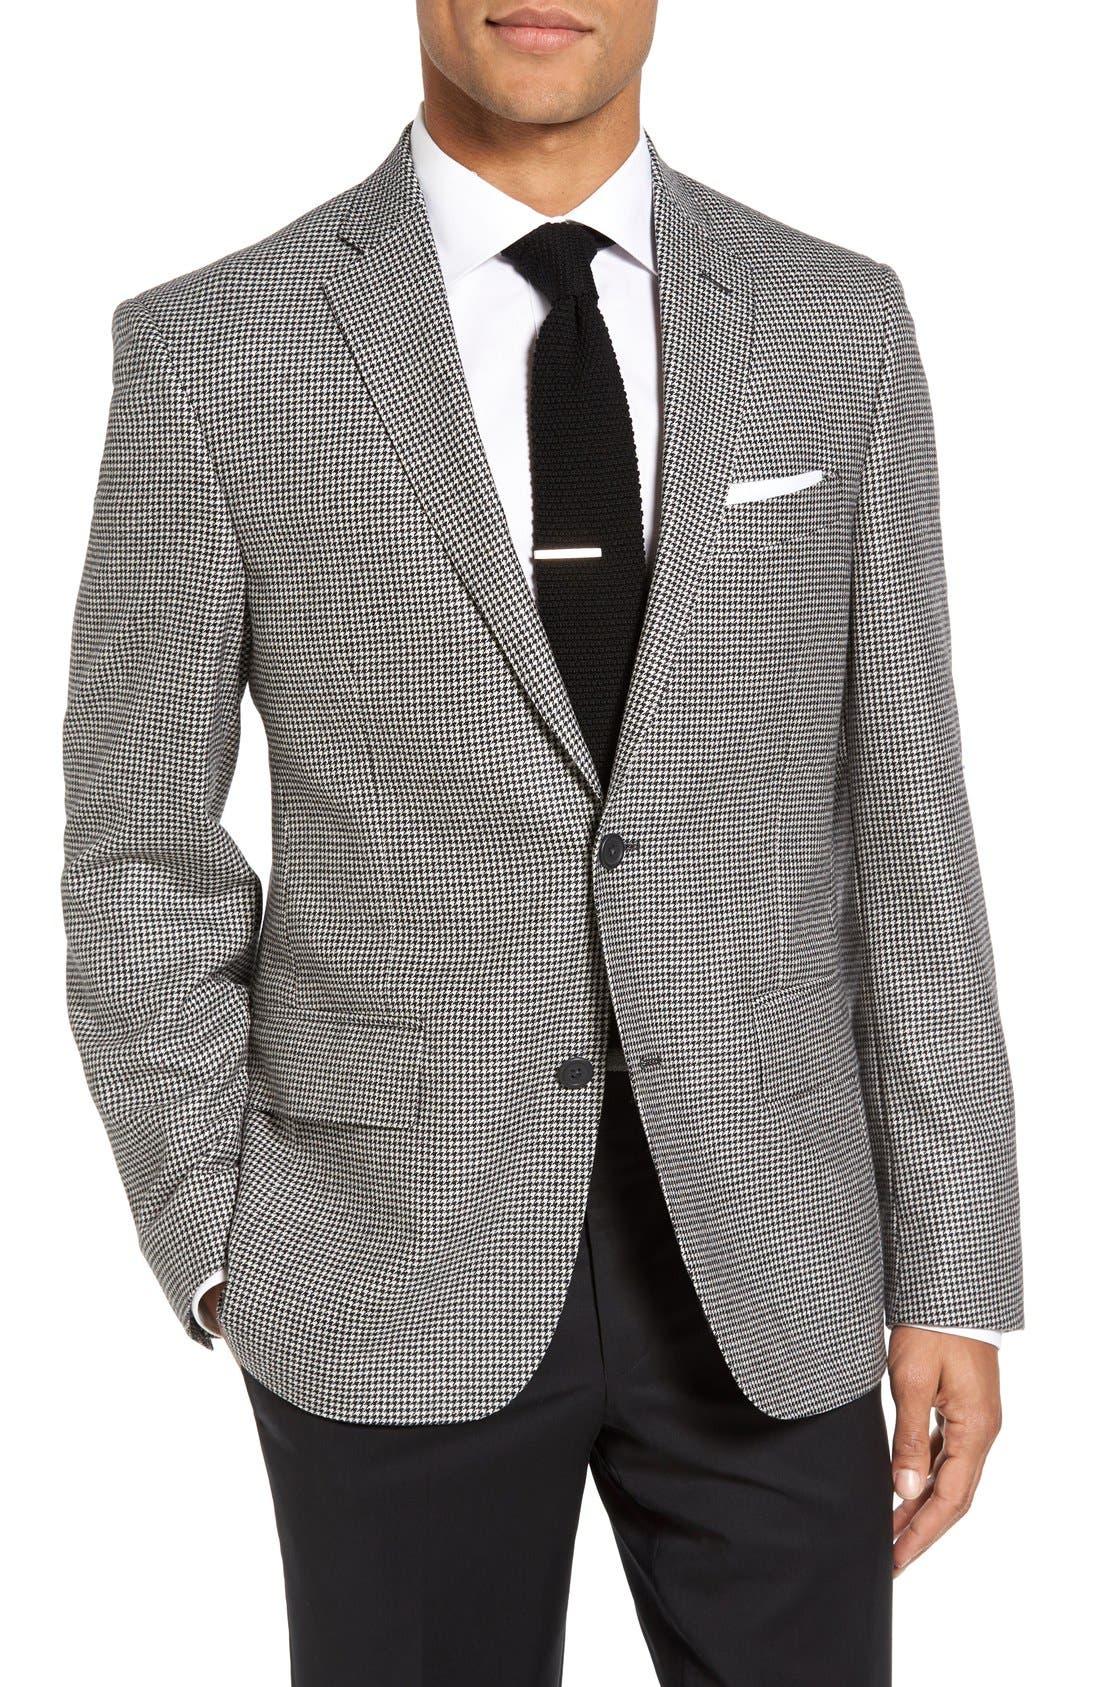 Nordstrom Men's Shop Classic Fit Houndstooth Wool & Cashmere Sport Coat